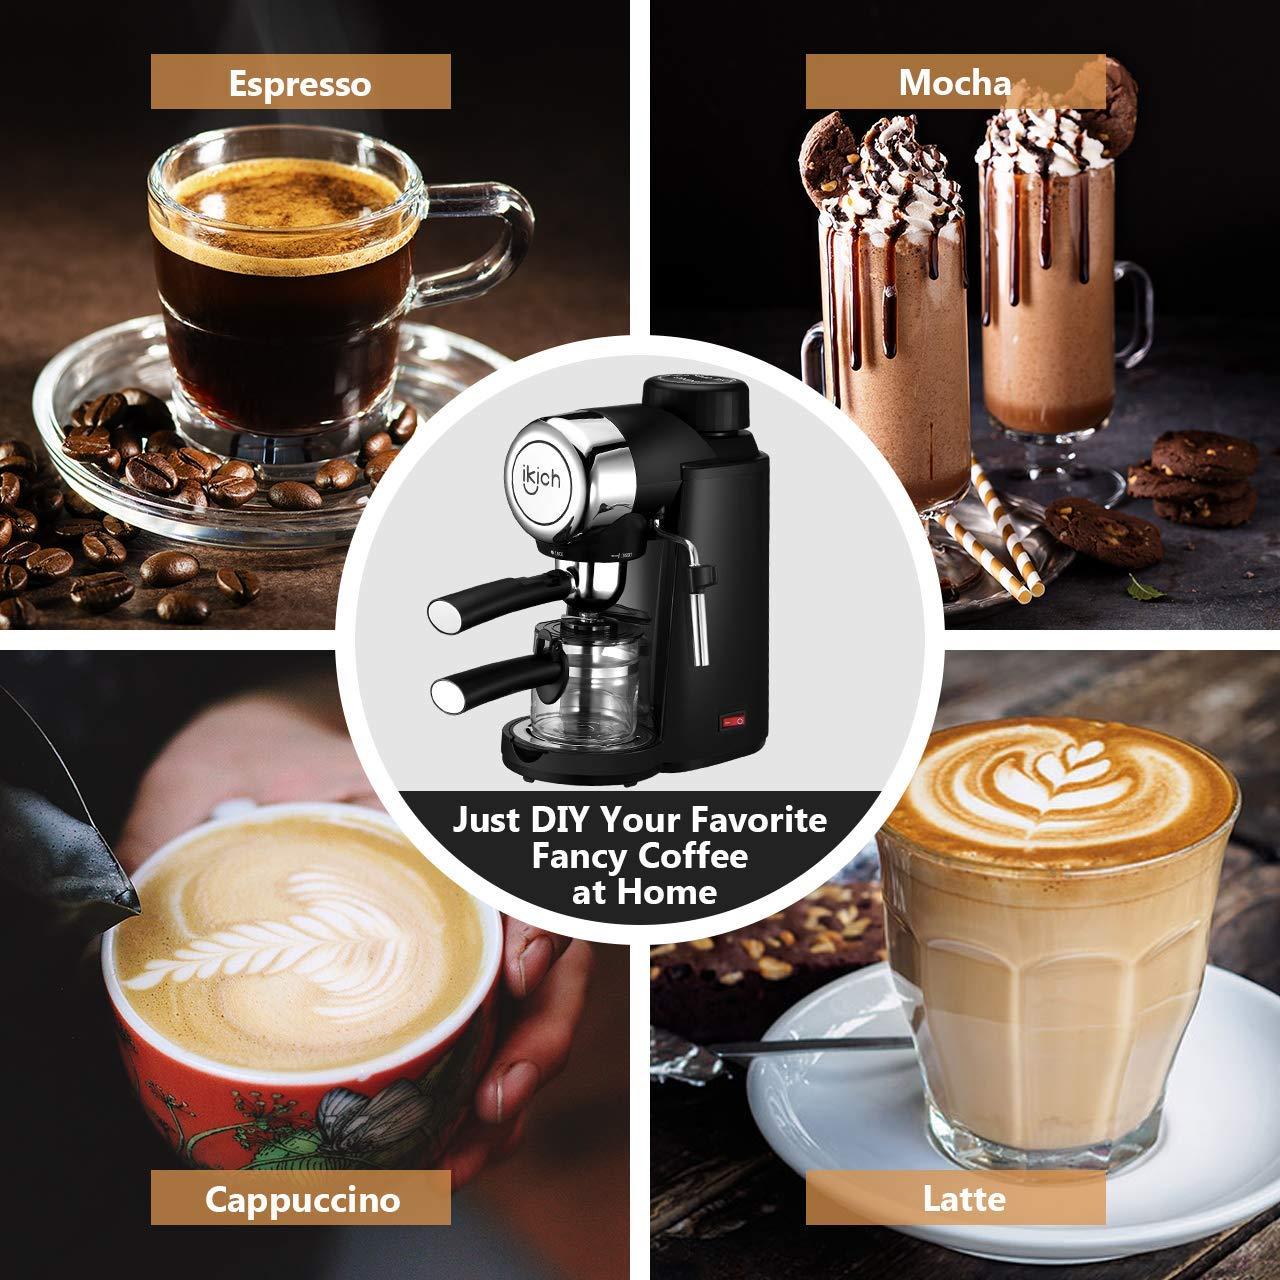 Espresso Machine, IKICH 3.5Bar 4Cup Espresso Coffee Maker with Spoon, Cappuccino Machine with Steam Milk Frother, Espresso Maker with Carafe, Black by IKICH